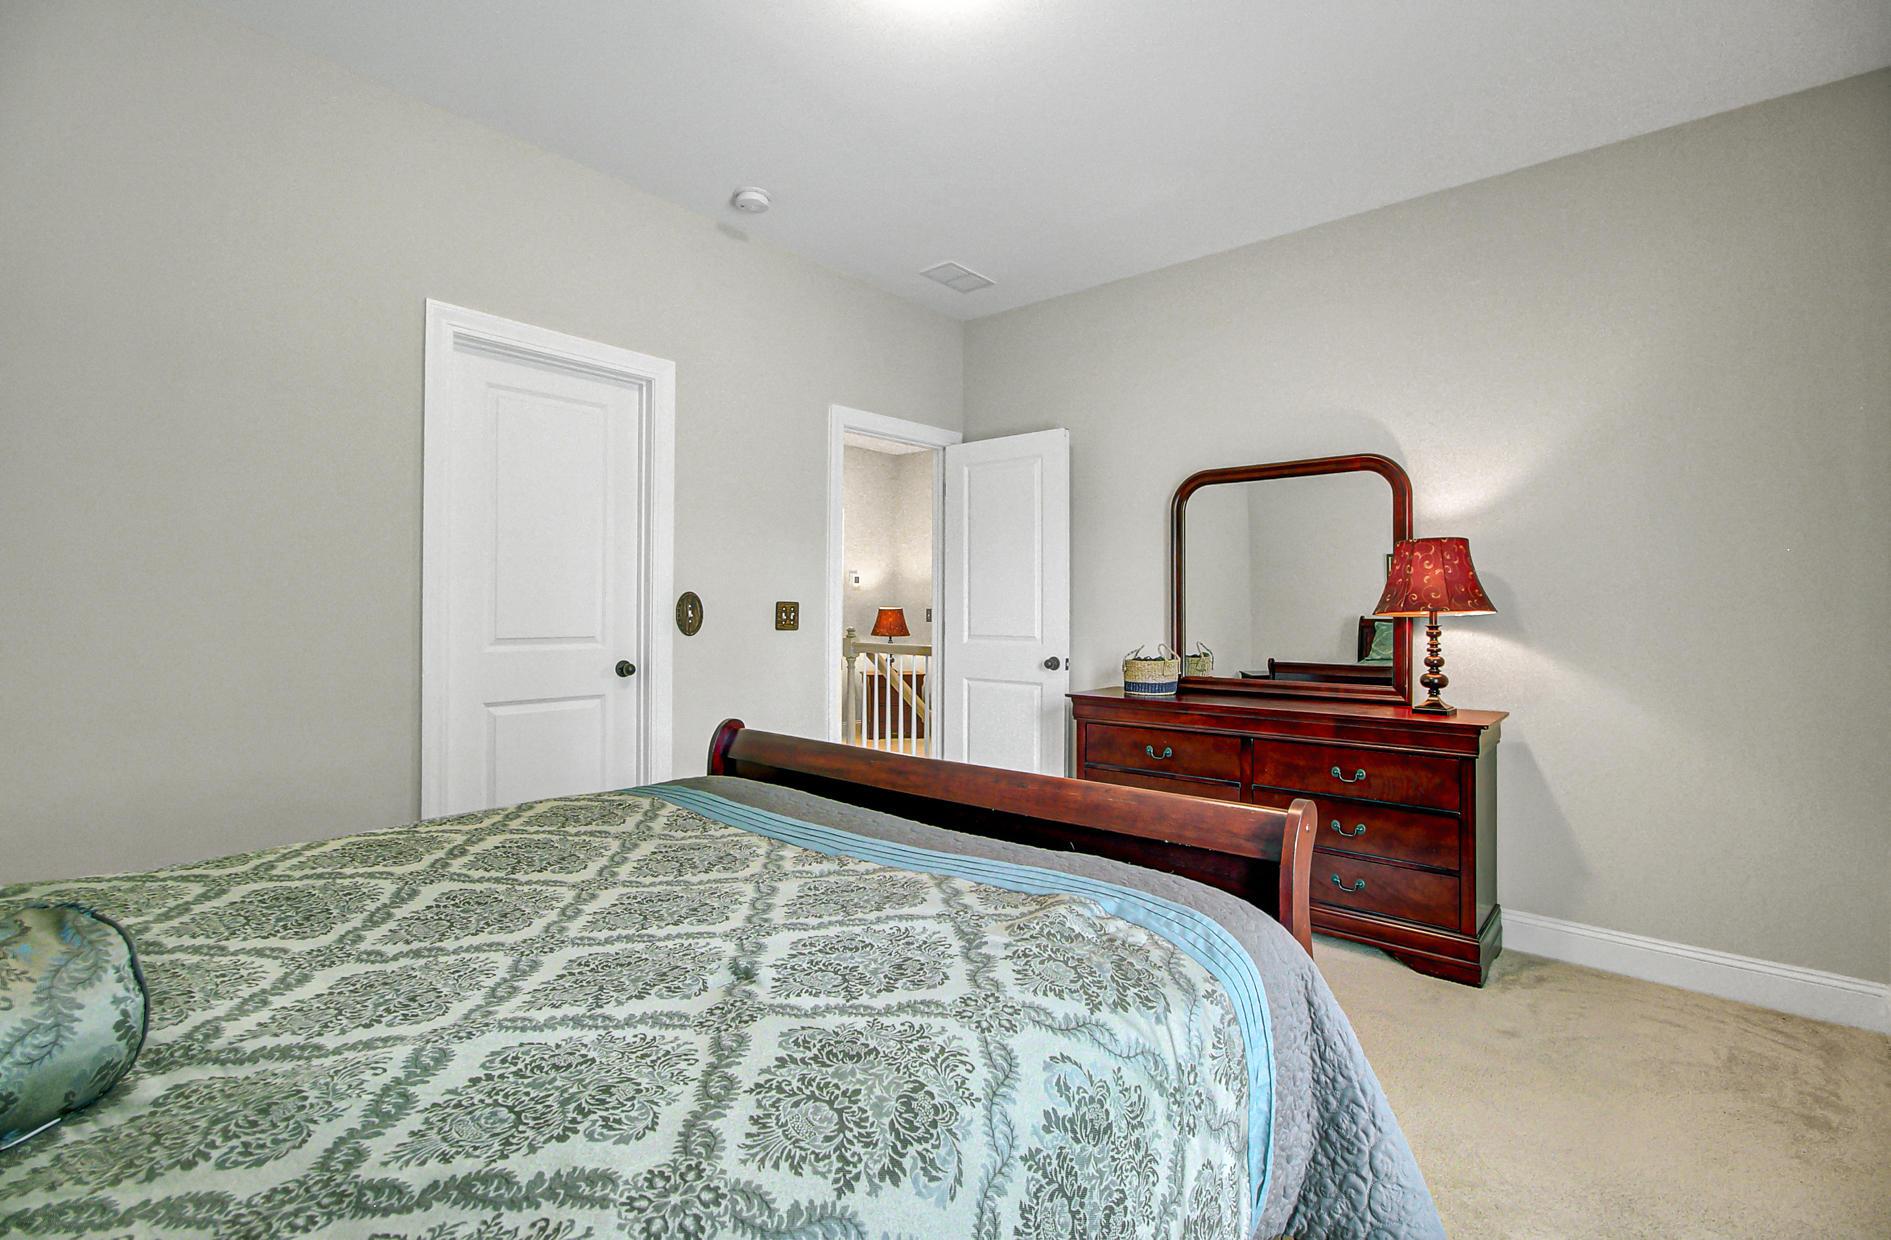 Park West Homes For Sale - 2824 Wagner, Mount Pleasant, SC - 33